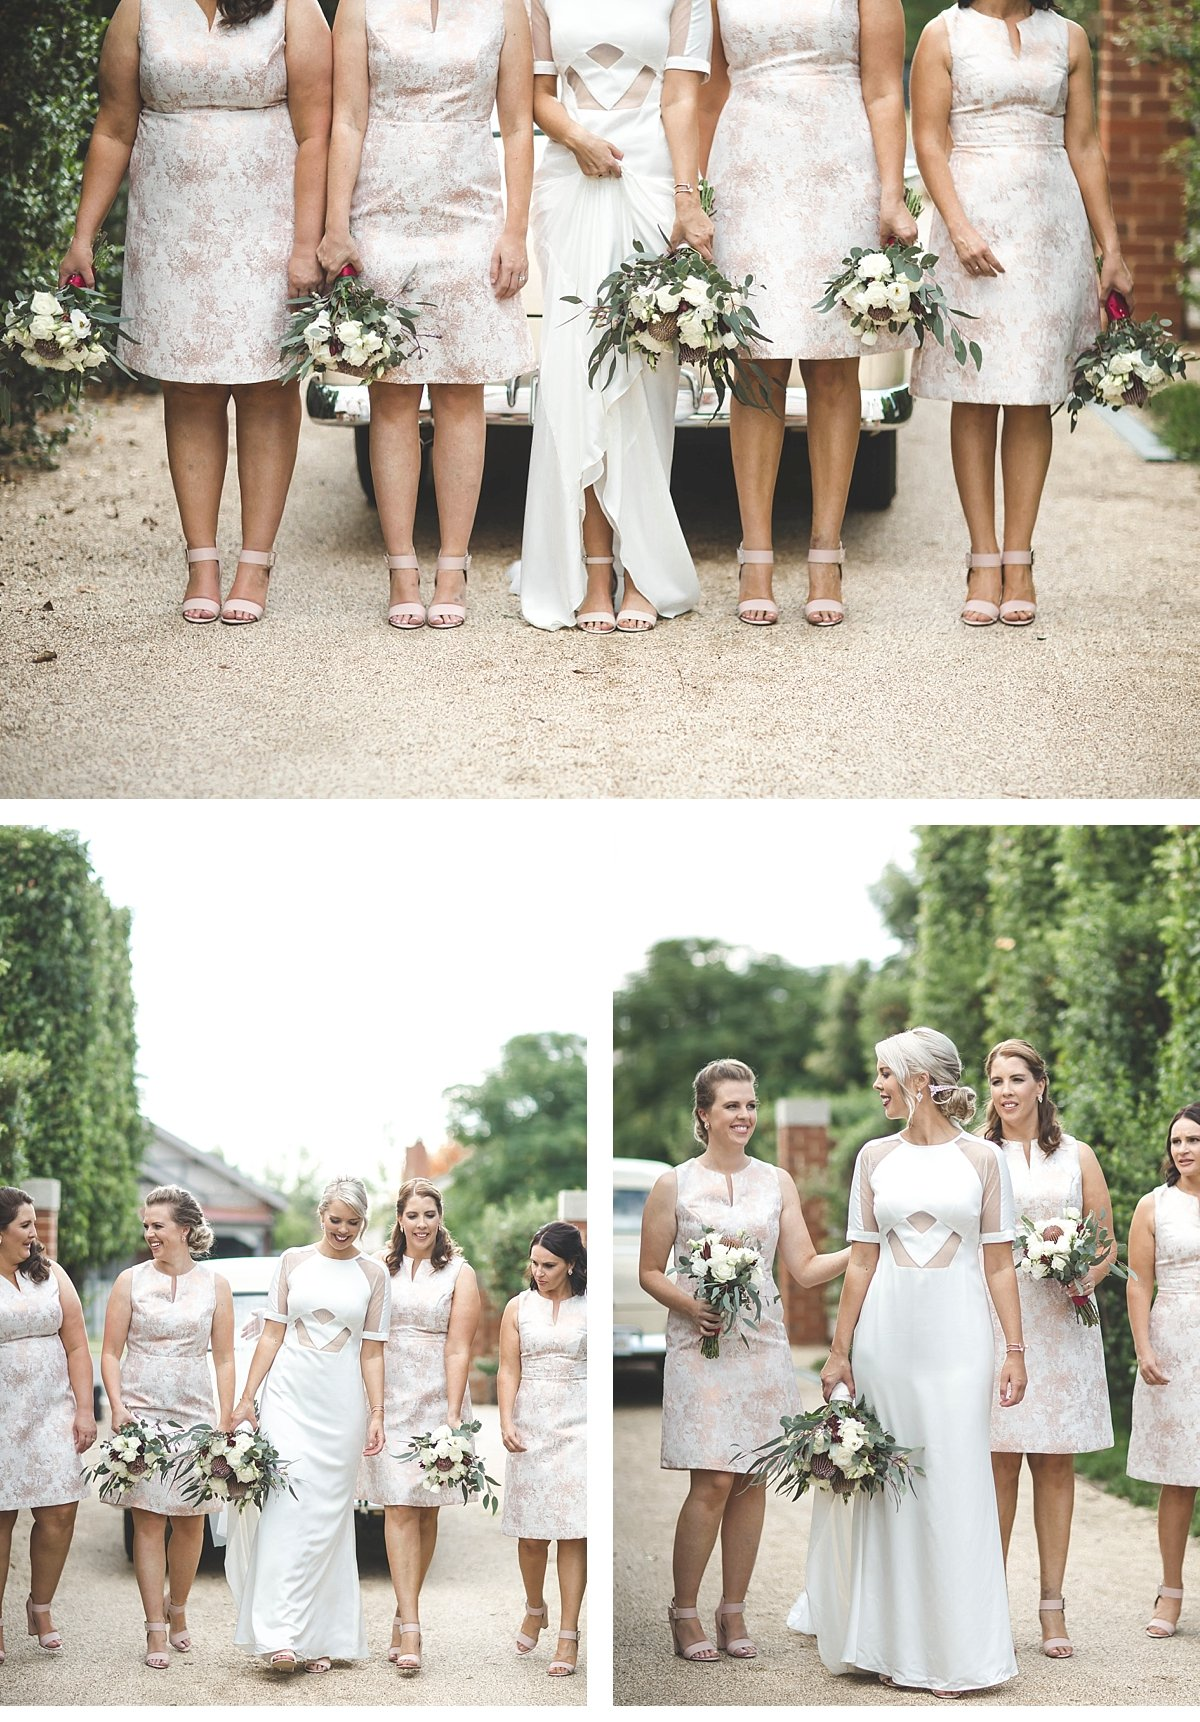 Burandana Hall wedding by Wagga Wagga Wedding Photographer Peppermint Studios_St Michaels Cathedral Wagga_Deniliquin weddings_0162